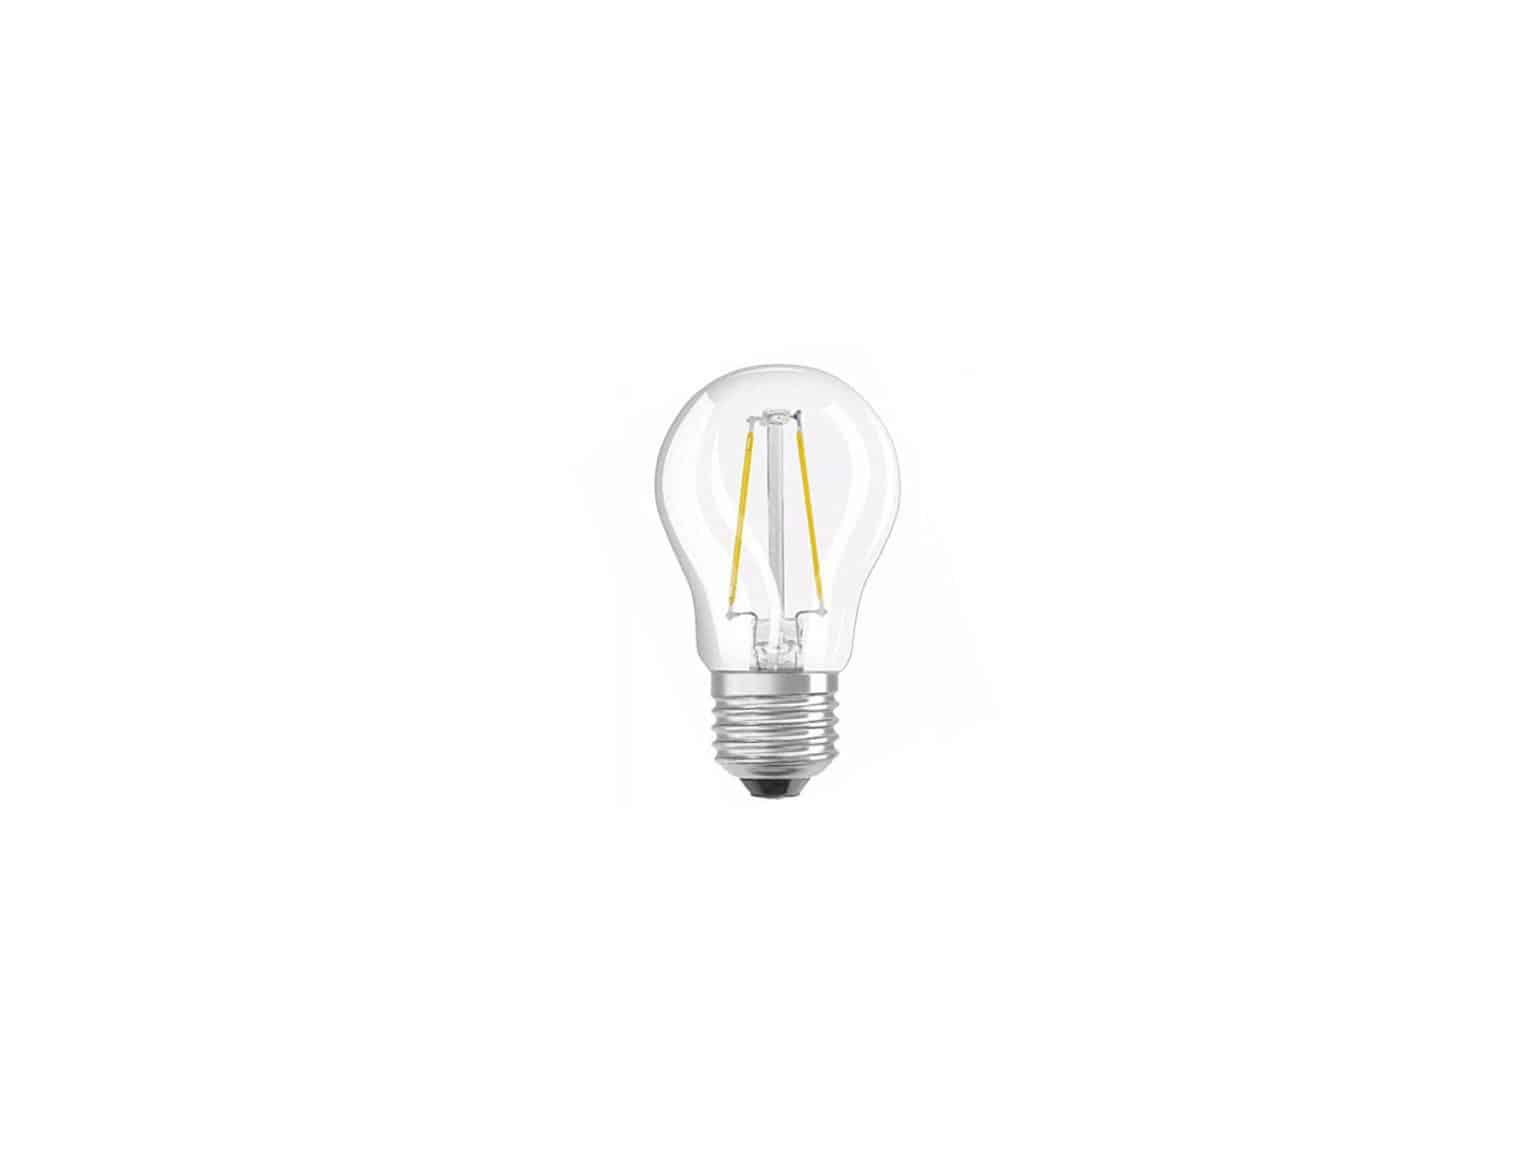 Weltevree Stringlight lamp